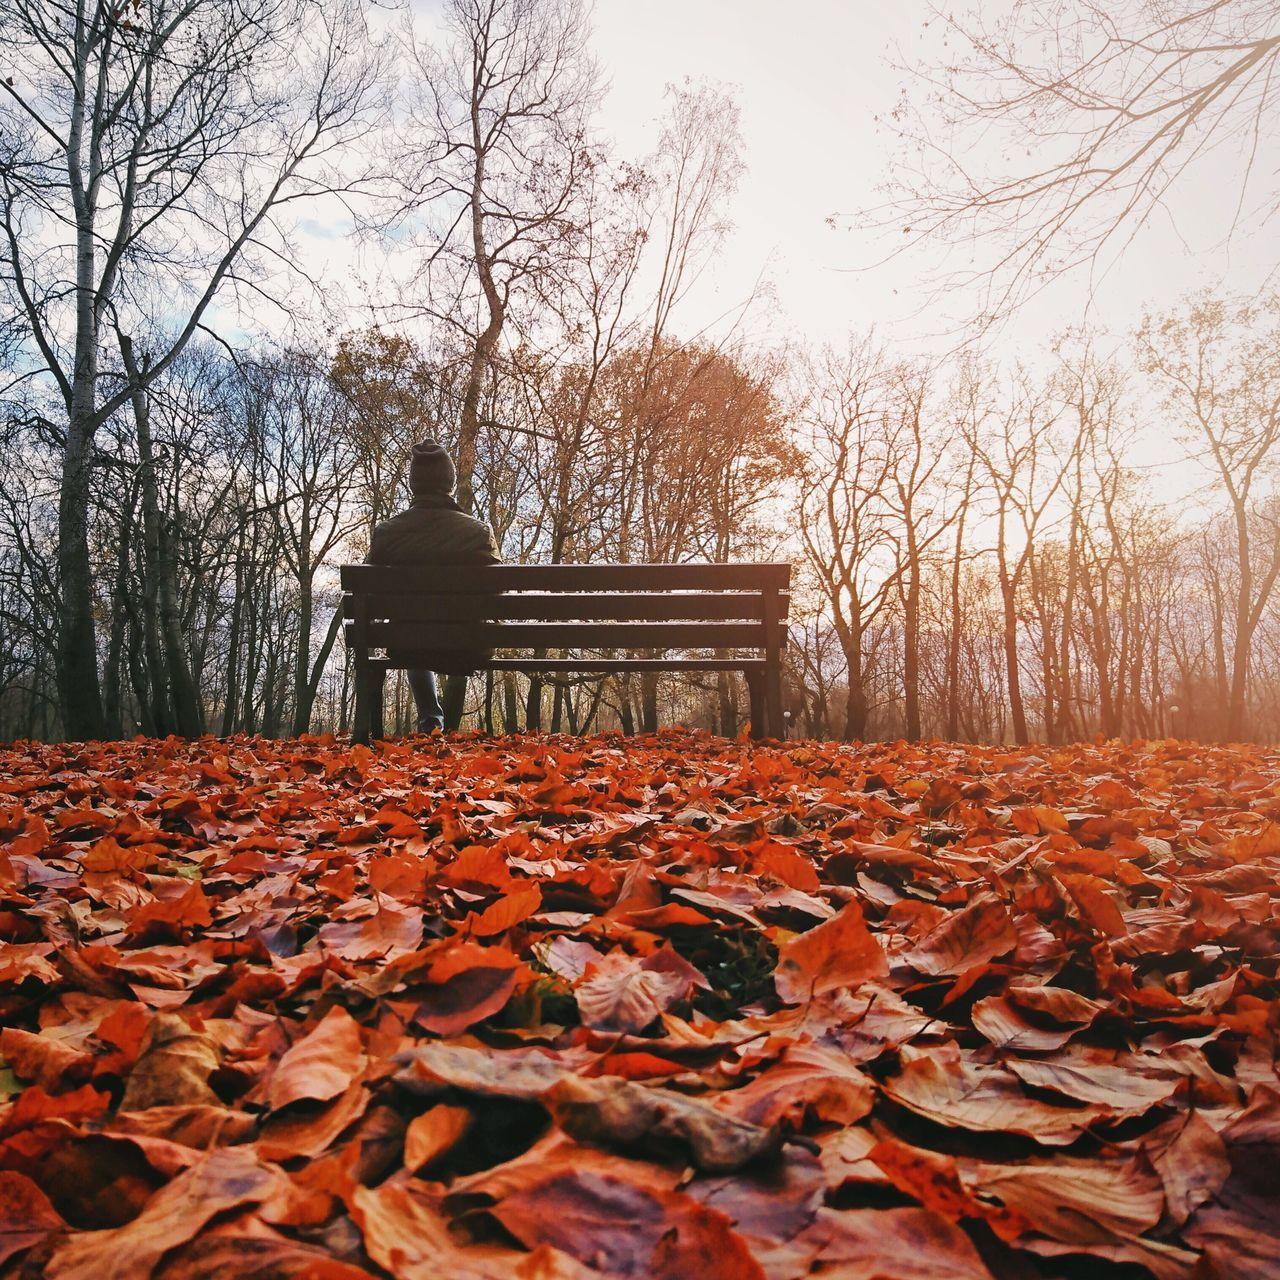 Autumn Fall Leaves Sunny Park Sunset Single Person